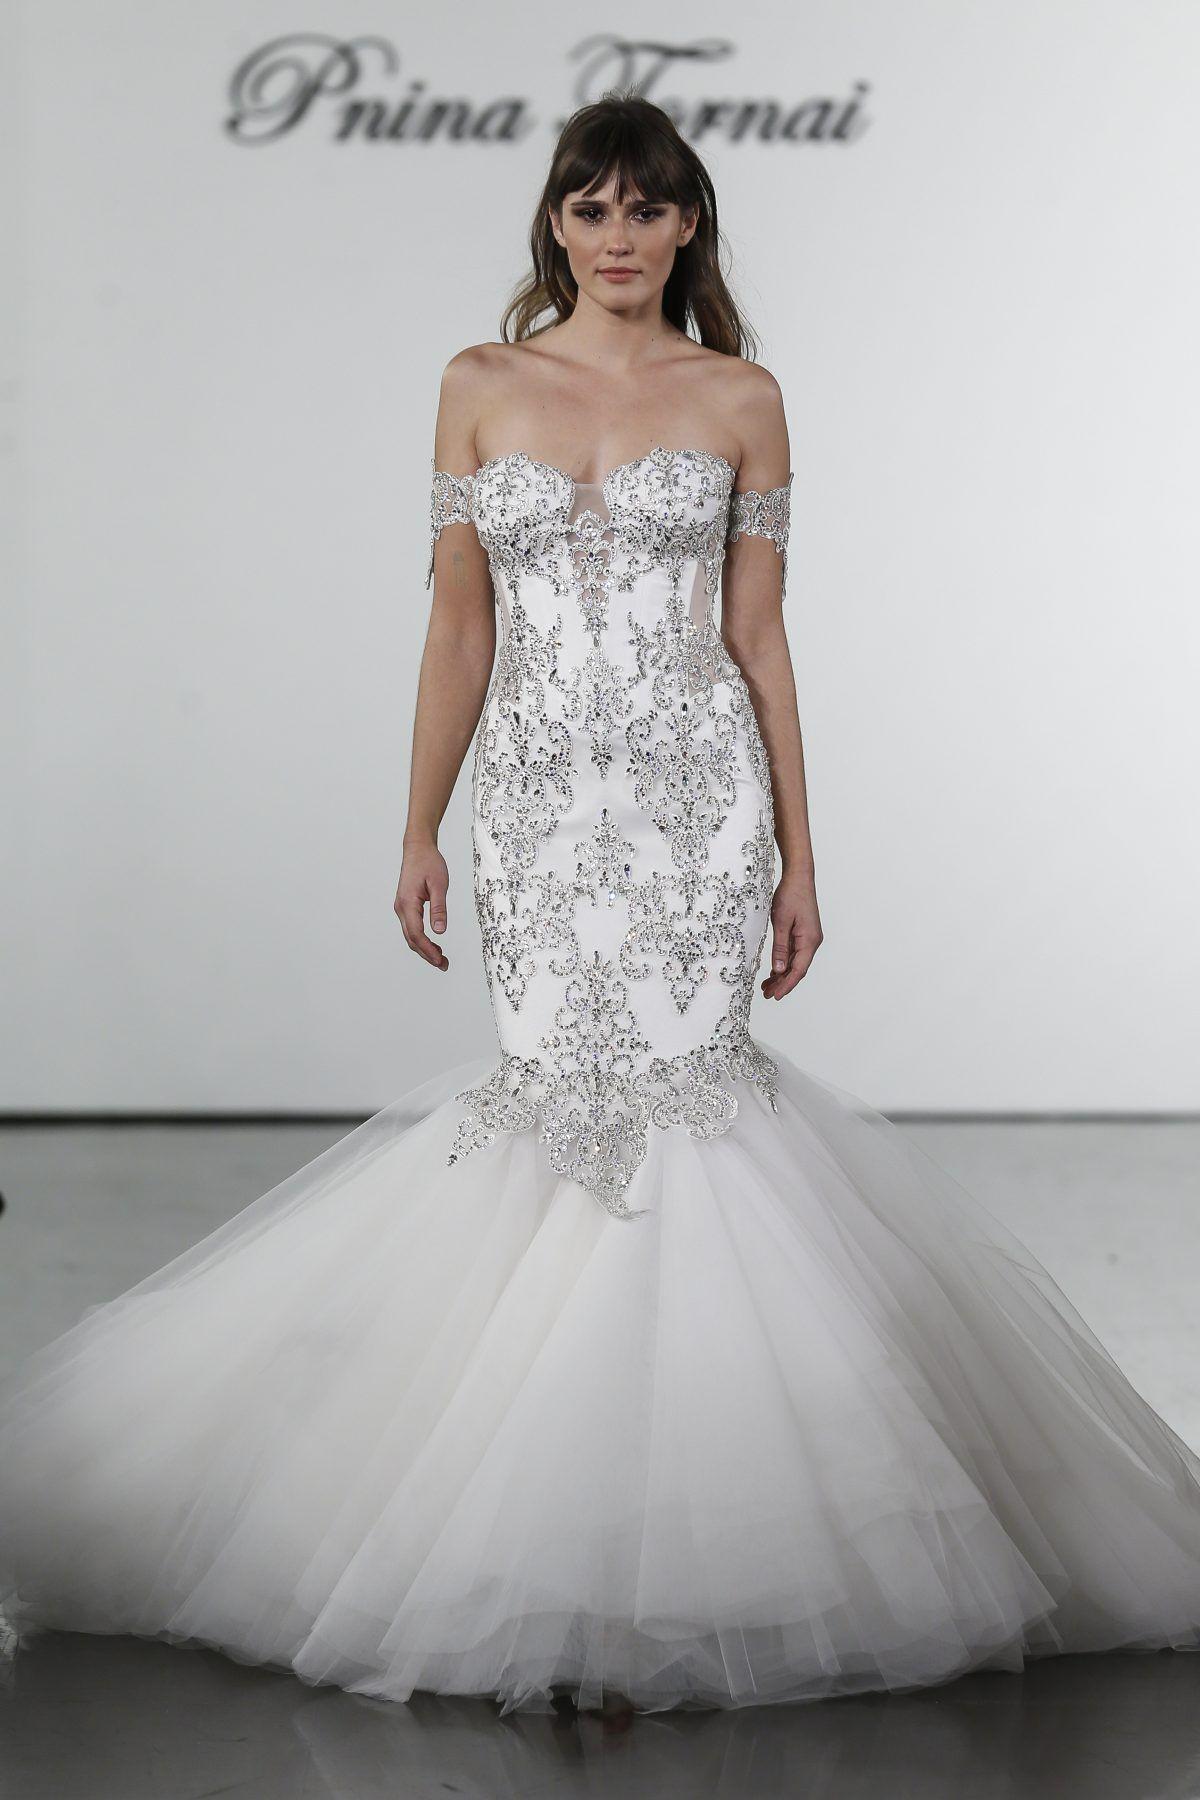 Embellished Sweetheart Mermaid Wedding Dress Pnina Tornai Style 4709 Expensive Wedding Dress Most Expensive Wedding Dress Pnina Tornai Wedding Dress [ 1800 x 1200 Pixel ]